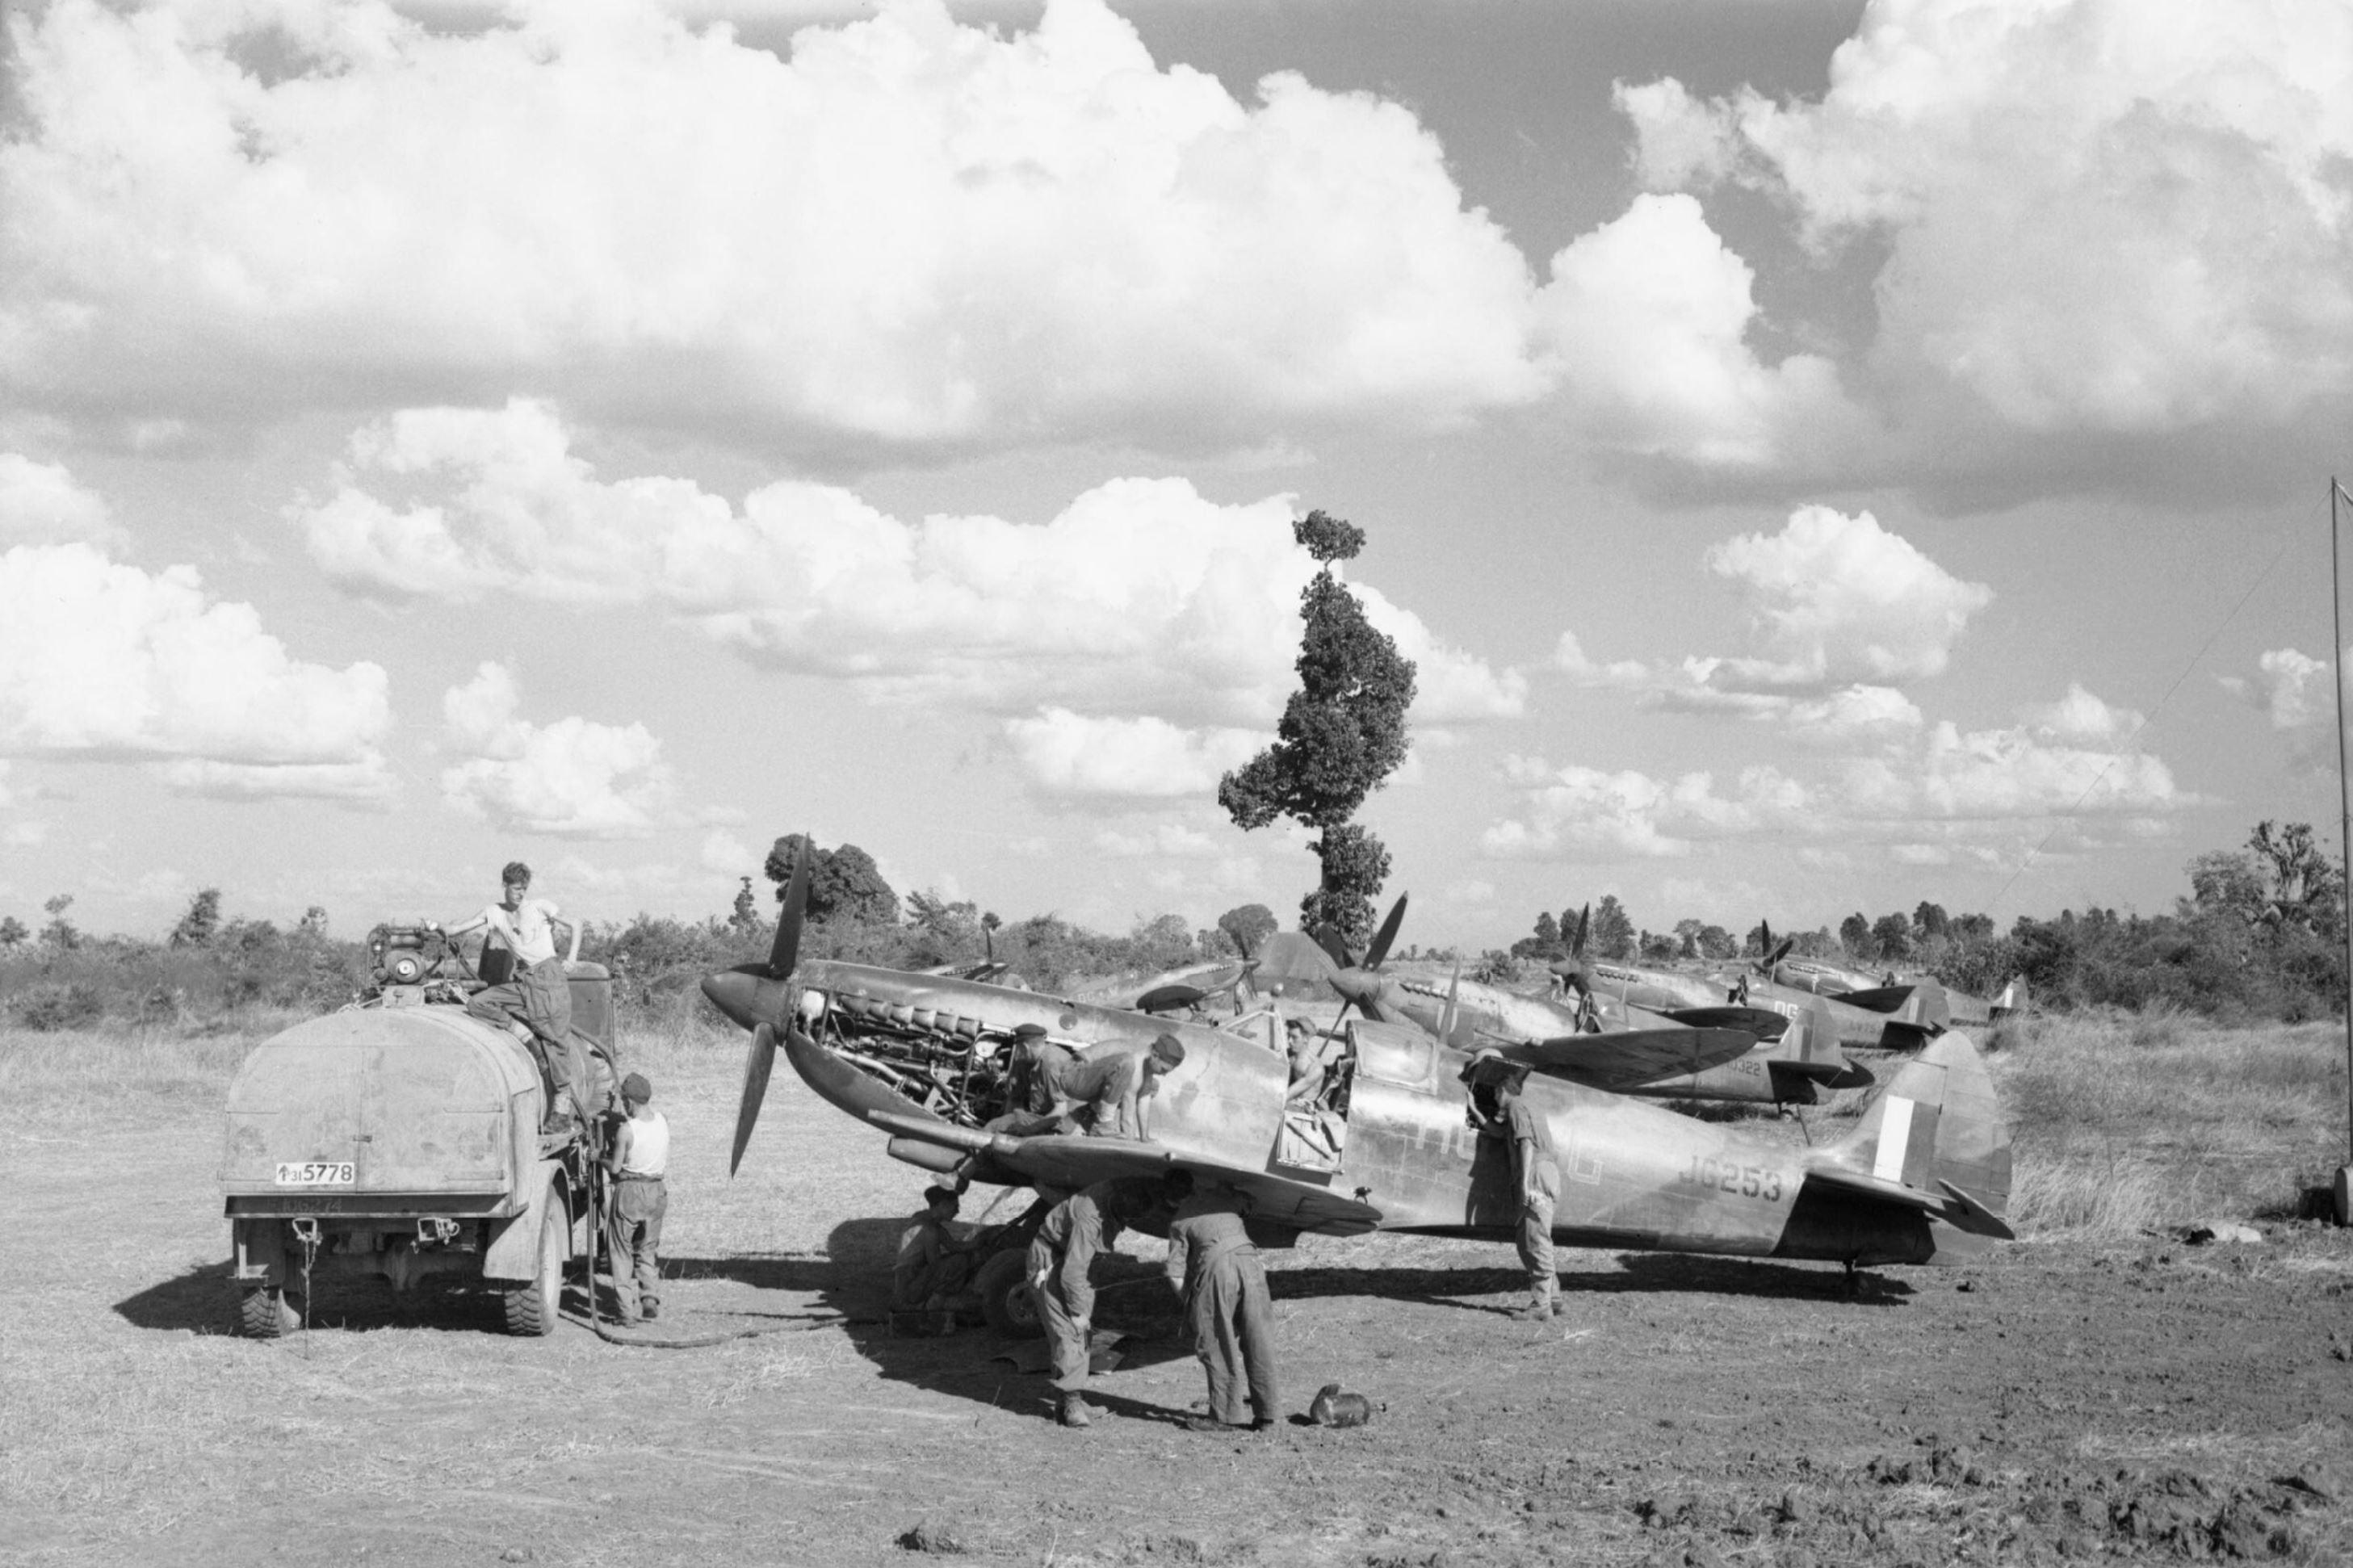 Spitfire MkVIII RAF 906 Wing HGG JG253 at Tabingaung 1944 IWM CF269